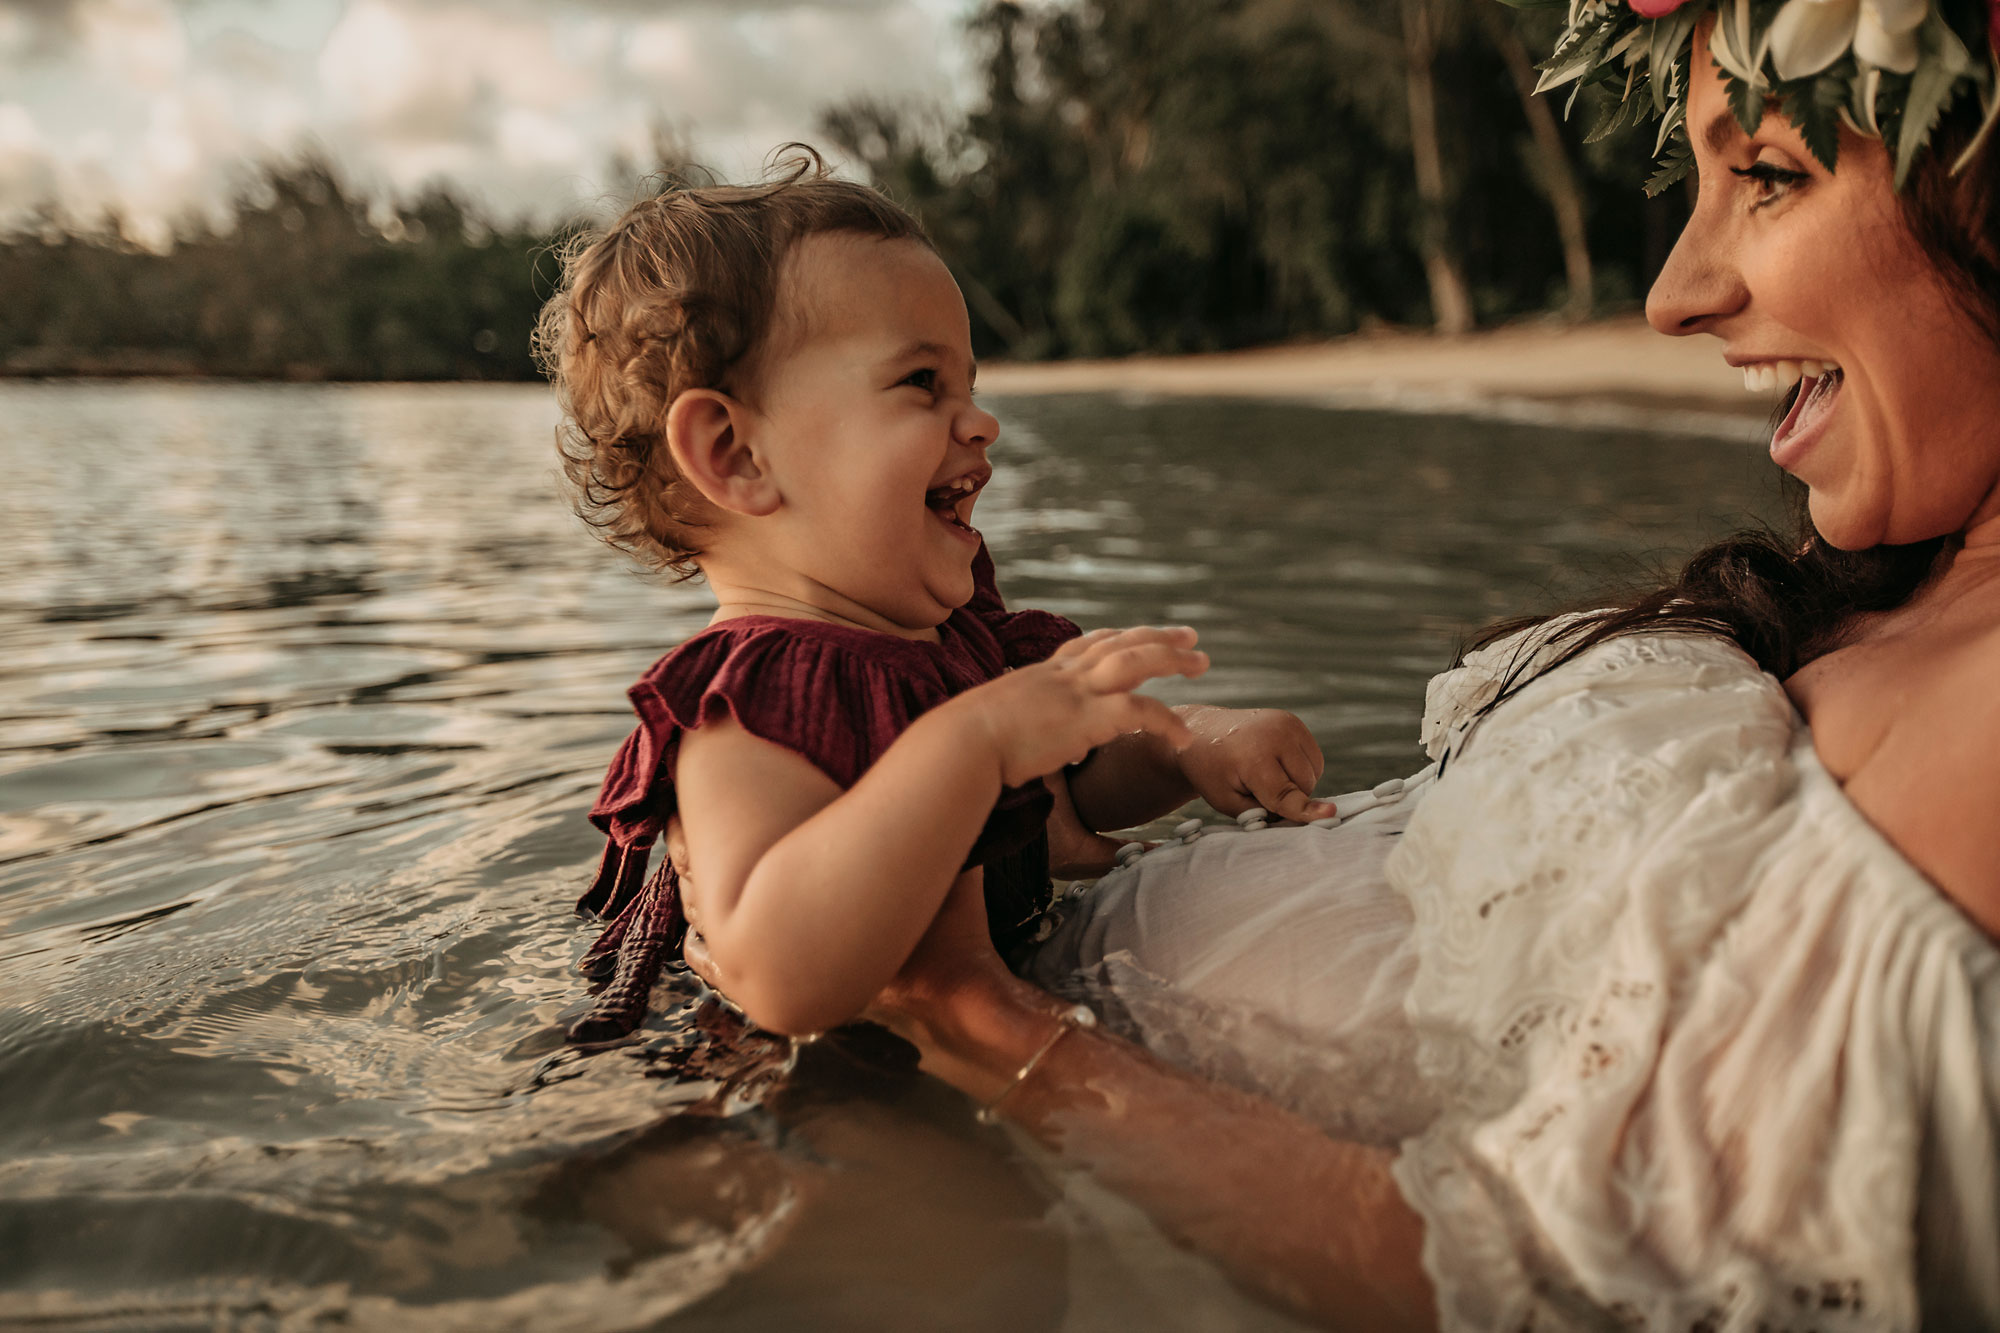 Hawaii-Oahu-Maternity-Photography-The-Sophia-Co-020.jpg